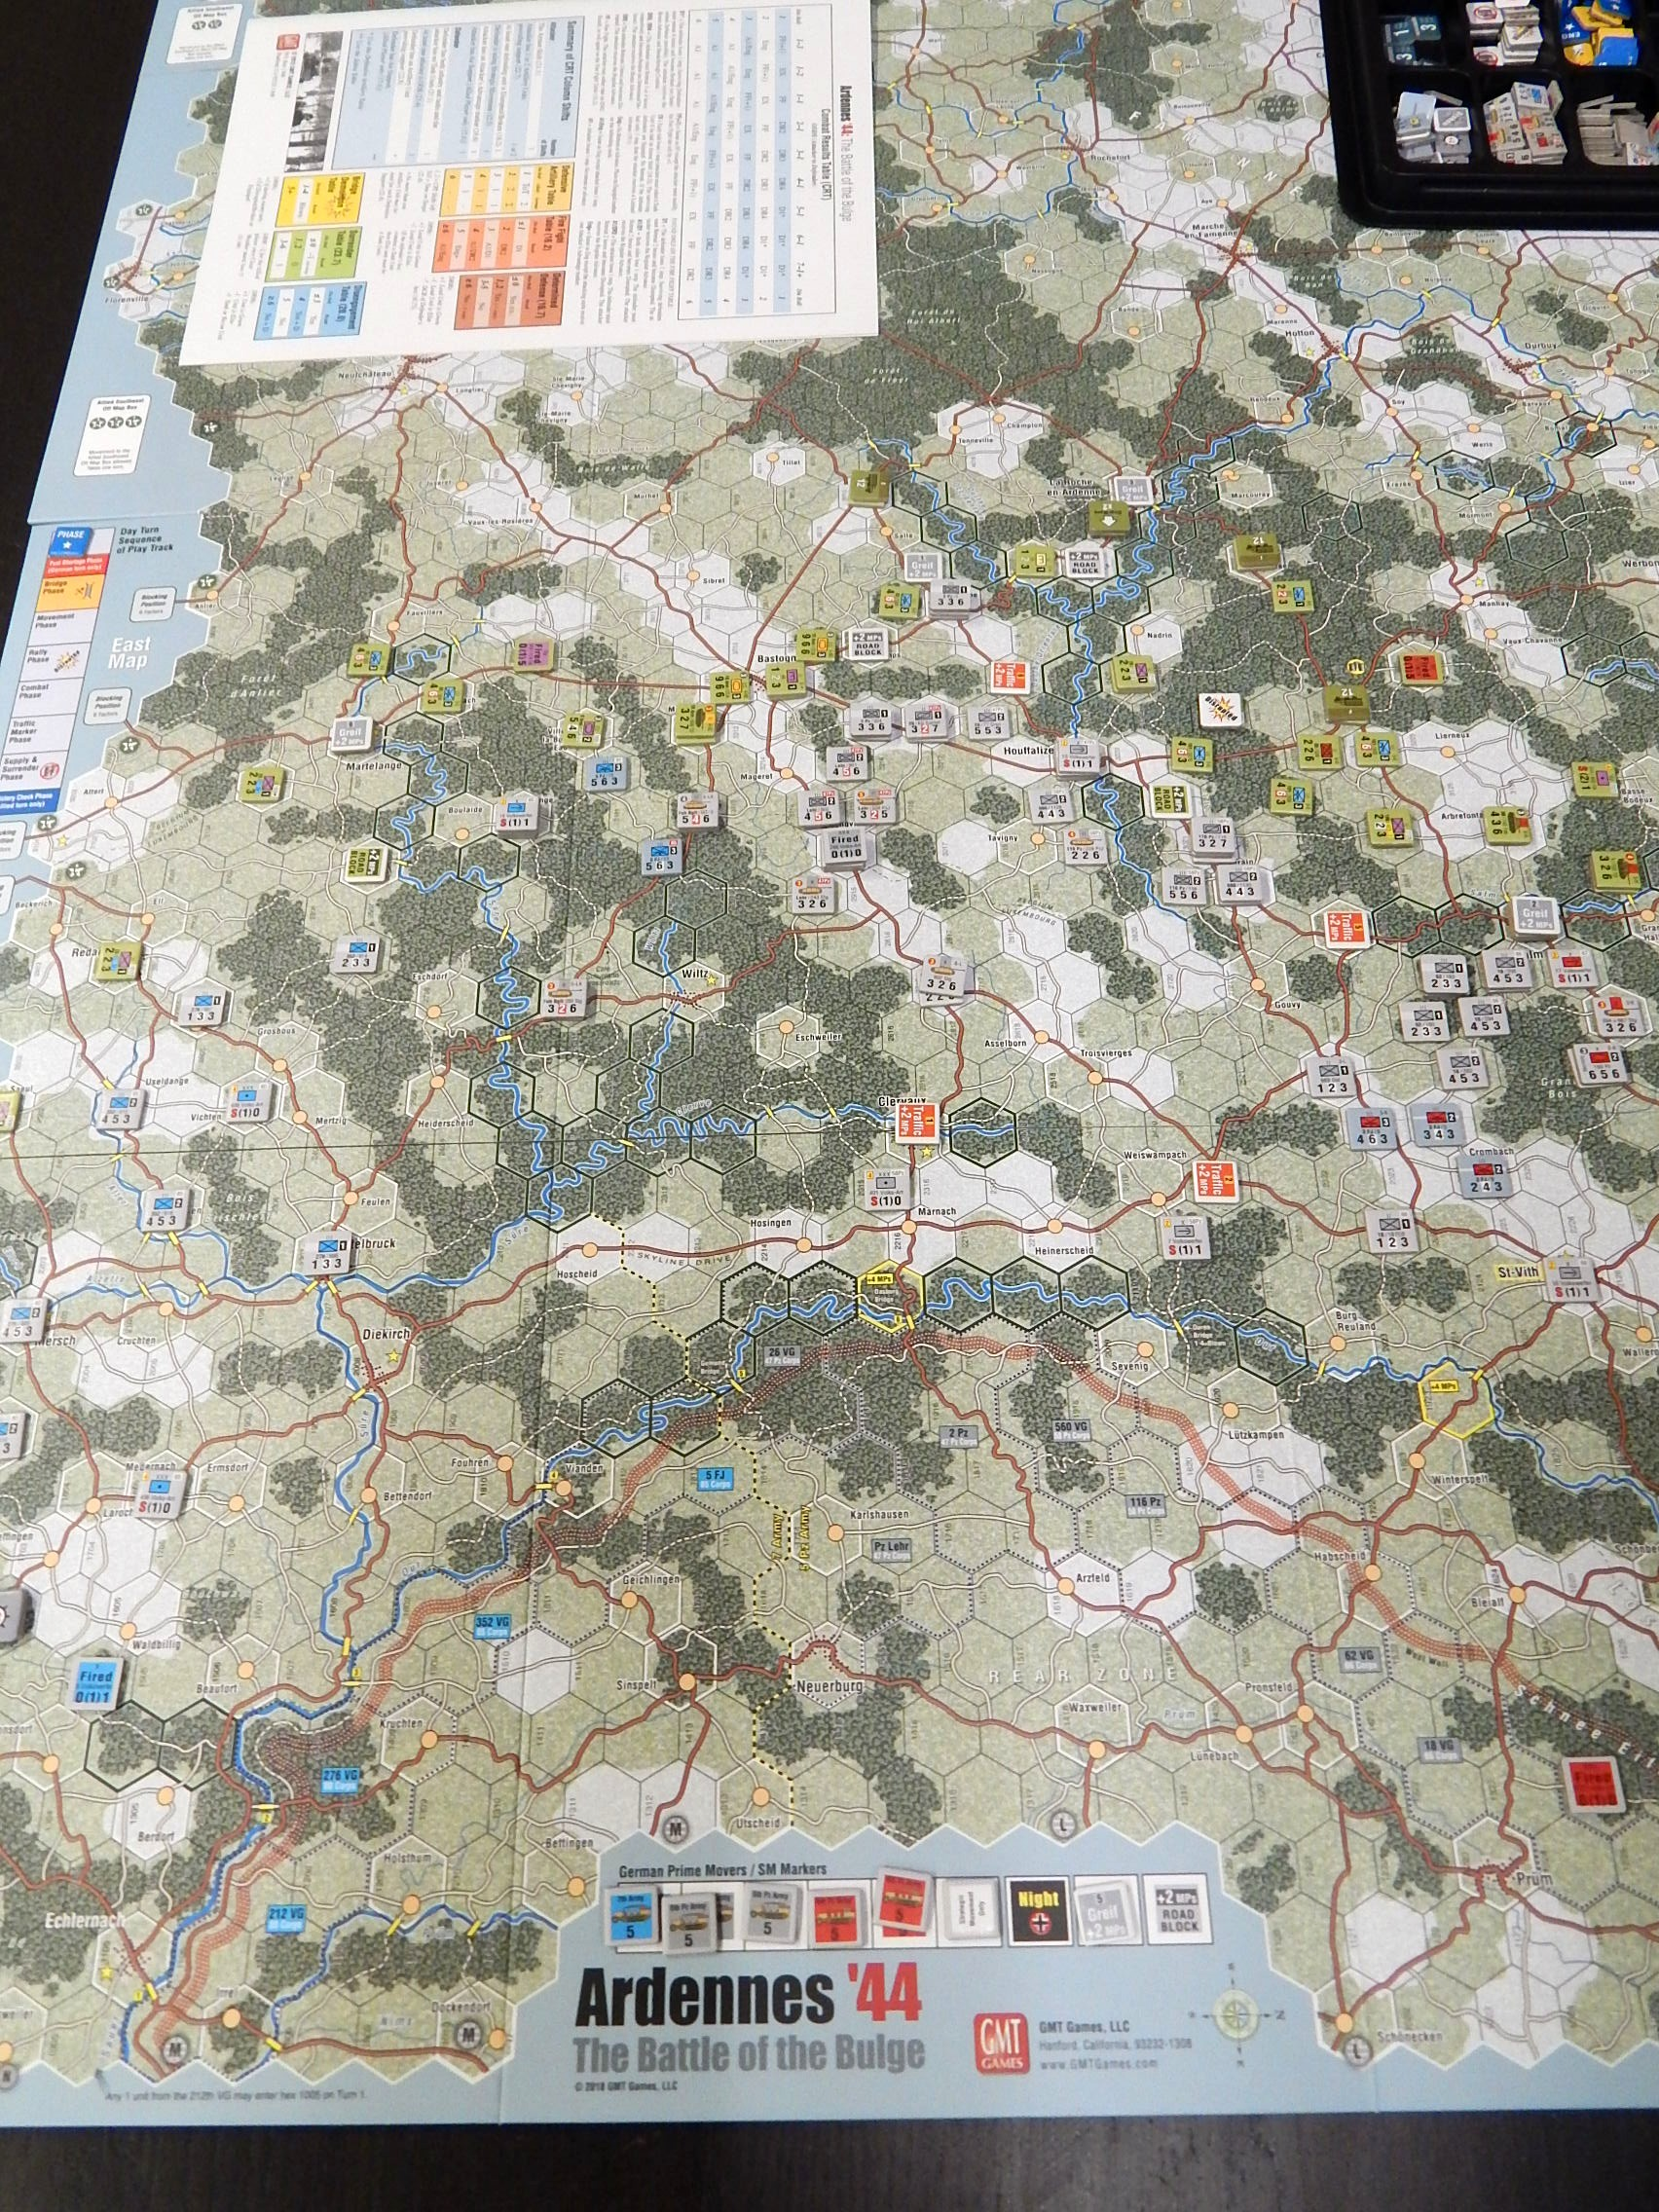 https://i.ibb.co/VDwv6x3/Ardennes-44-Setup-A.jpg